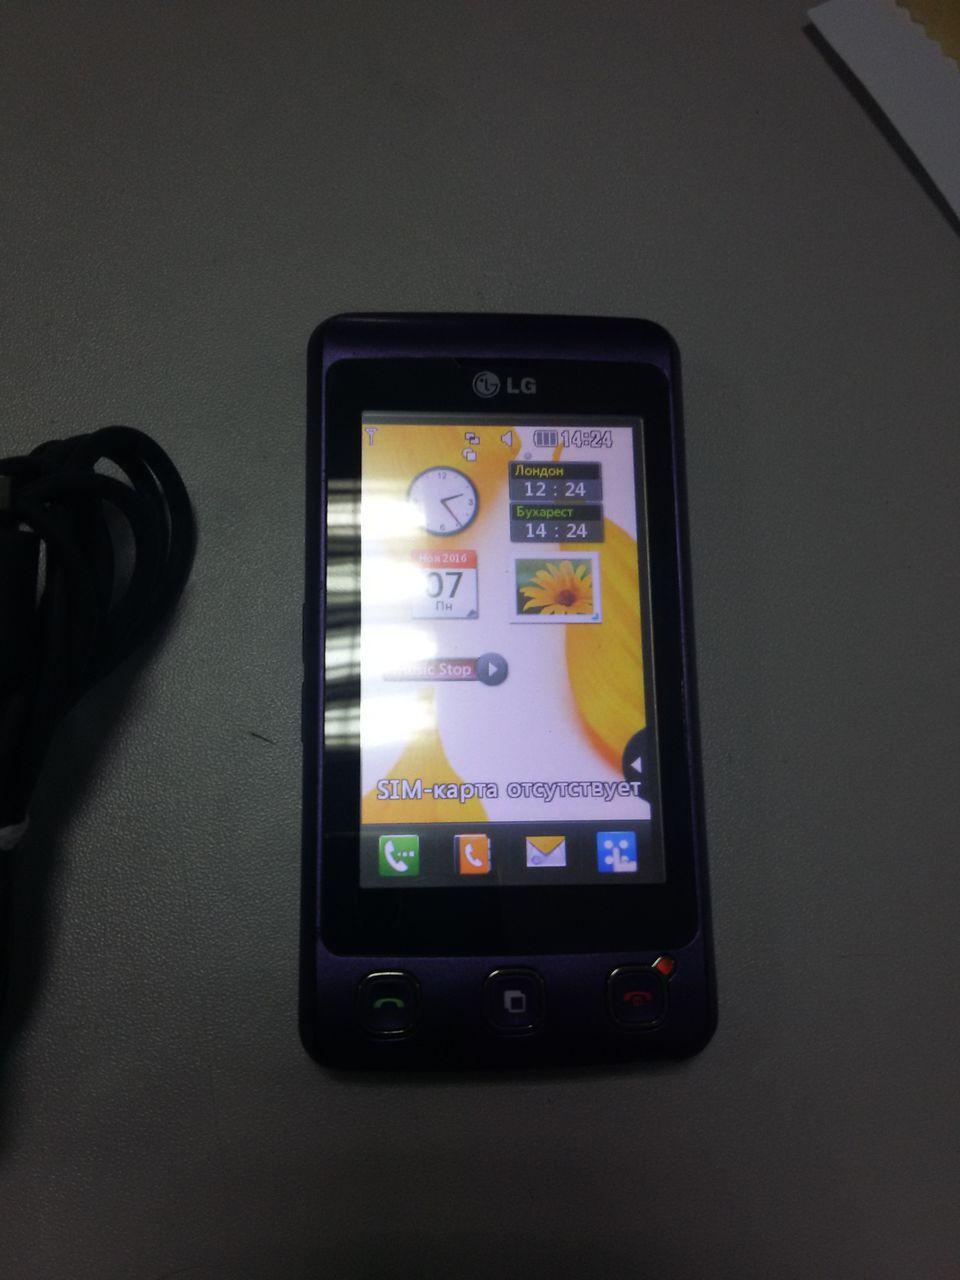 lg kp500 cookie motion sensor games